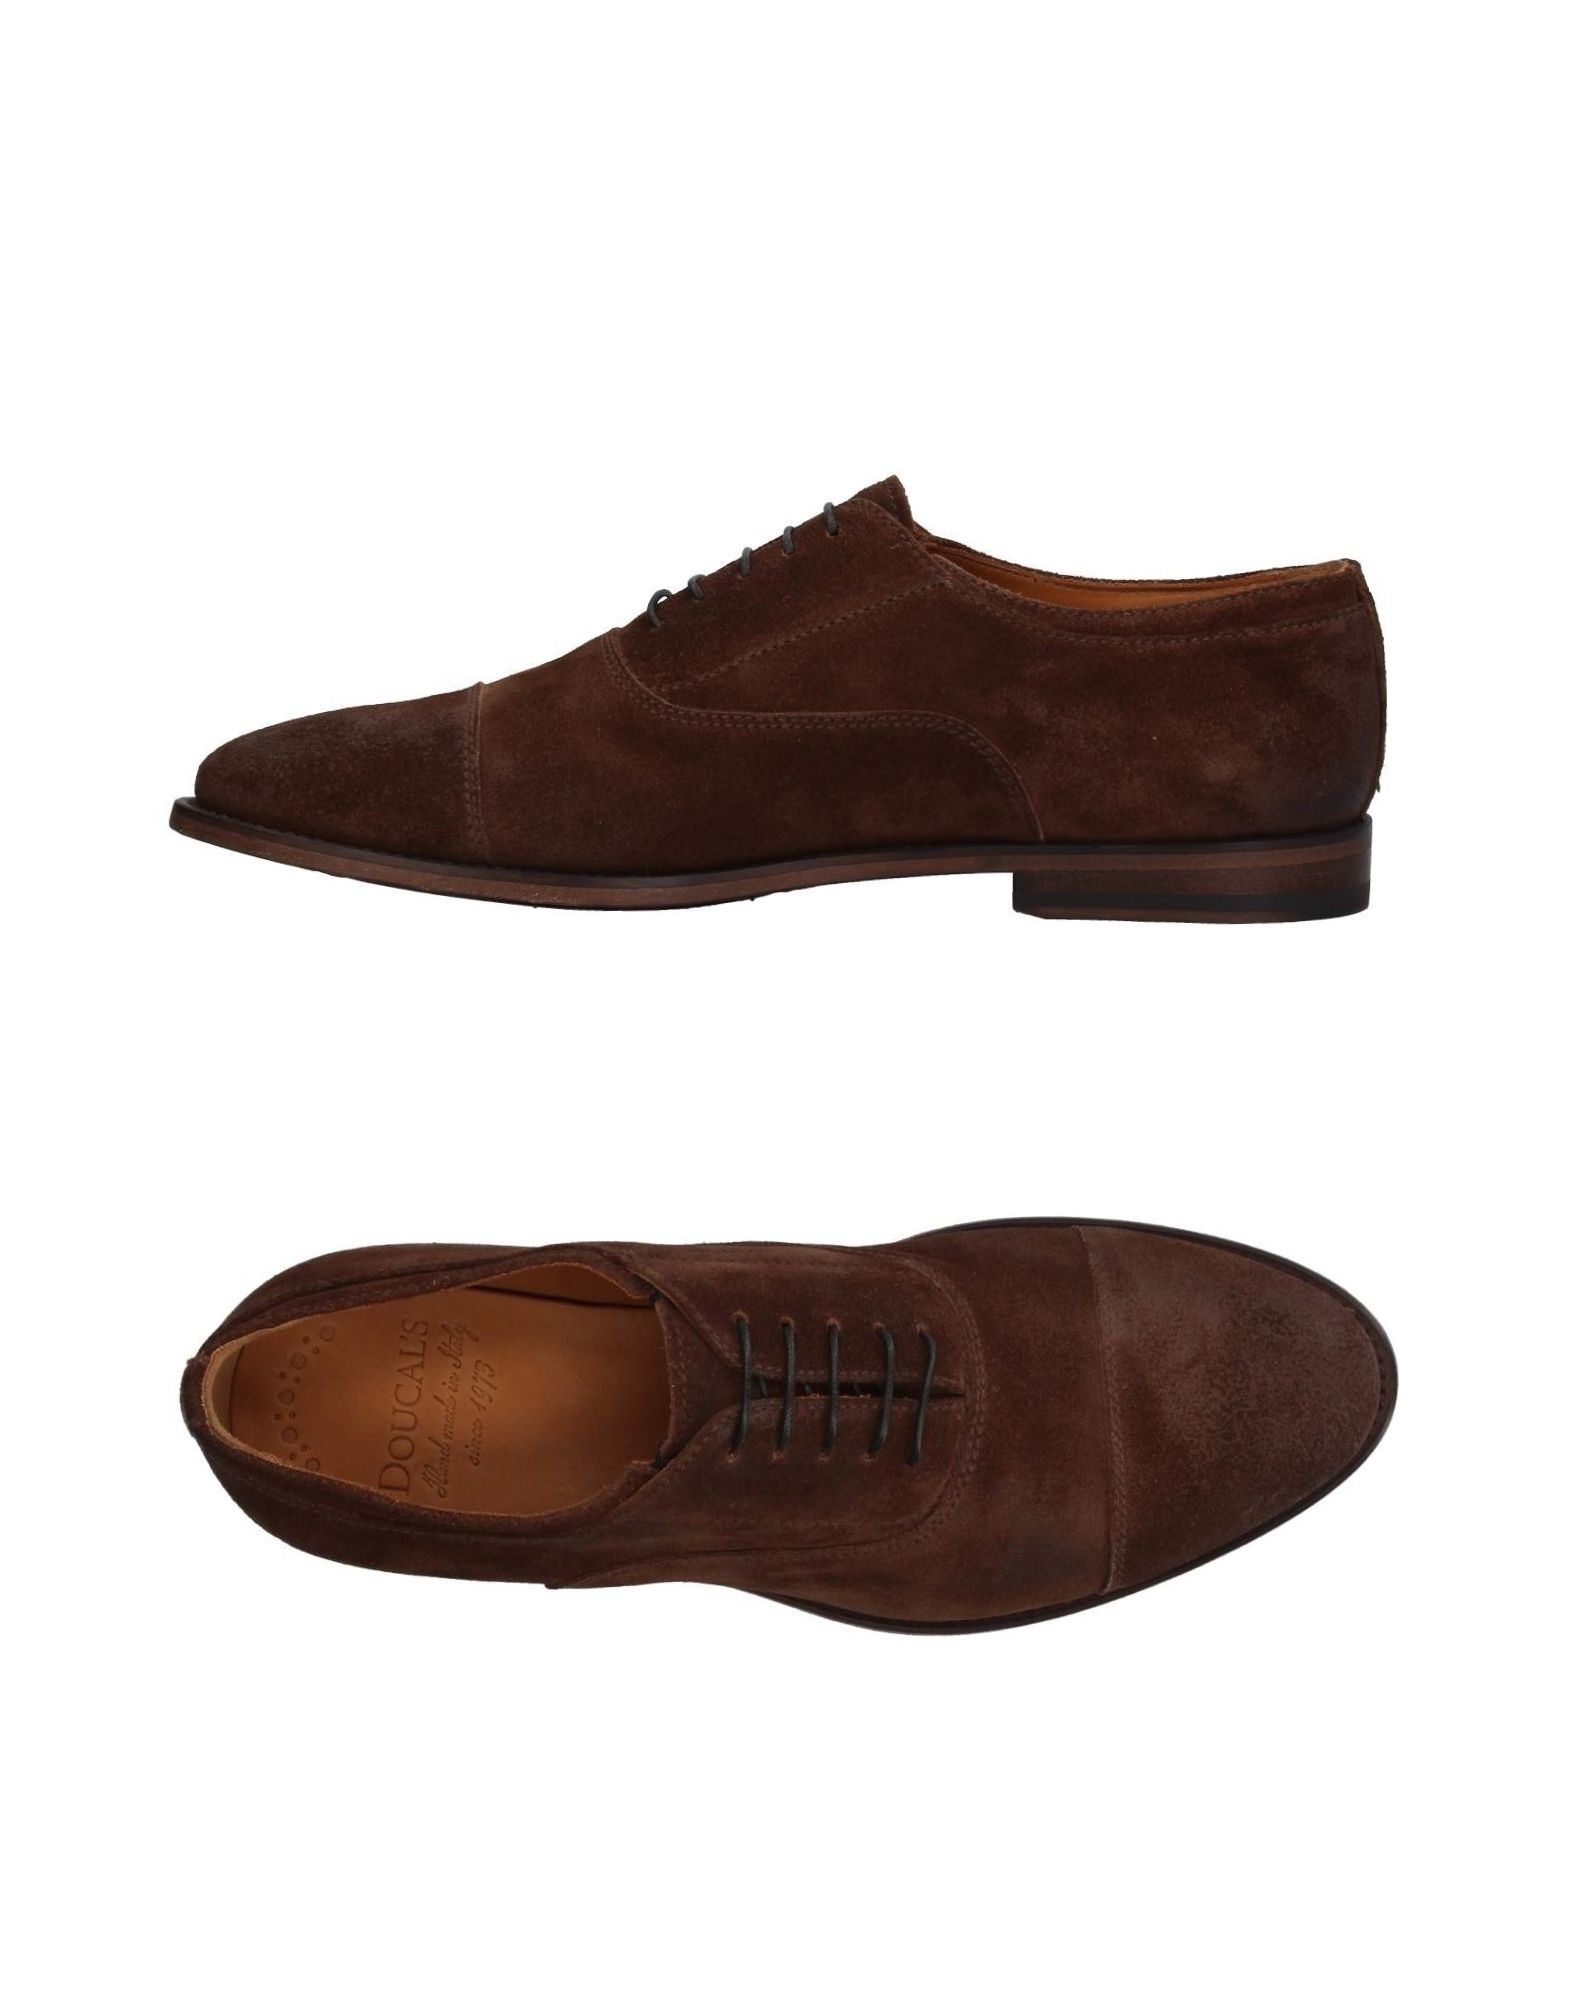 Rabatt echte Schuhe Doucal's Schnürschuhe Herren Herren Schnürschuhe  11407447FG 30bdce